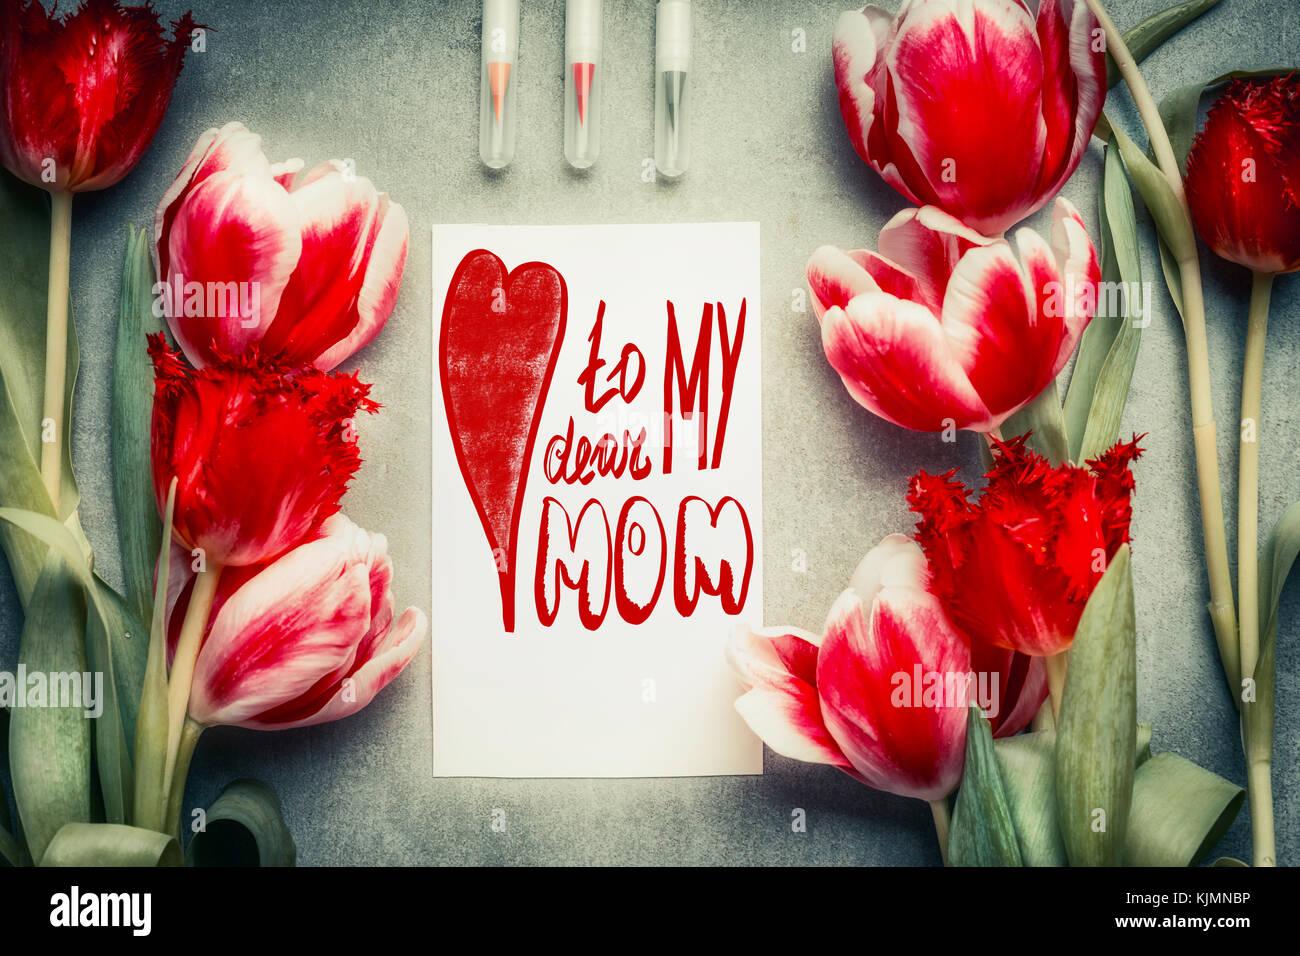 Dear Mom Stockfotos & Dear Mom Bilder - Alamy